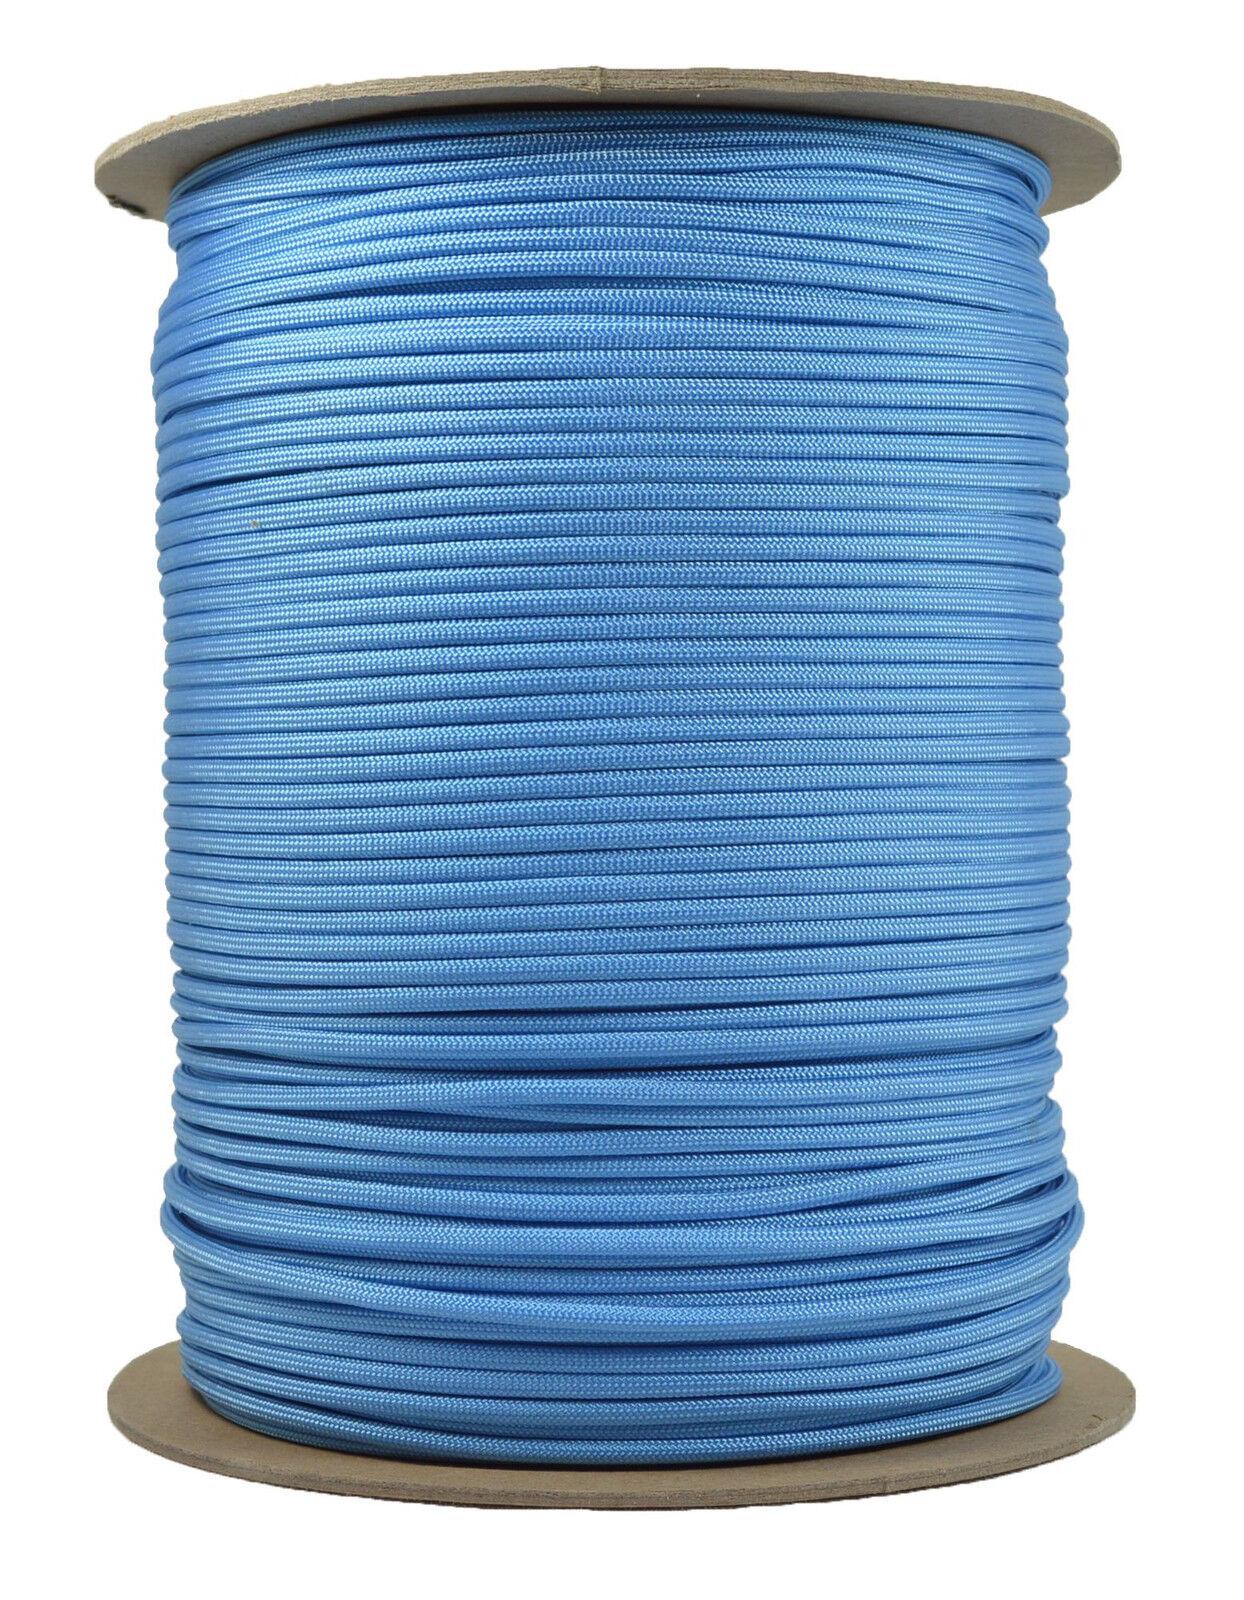 Tarheel bluee - 550 Paracord Rope 7 strand Parachute Cord - 1000 Foot Spool